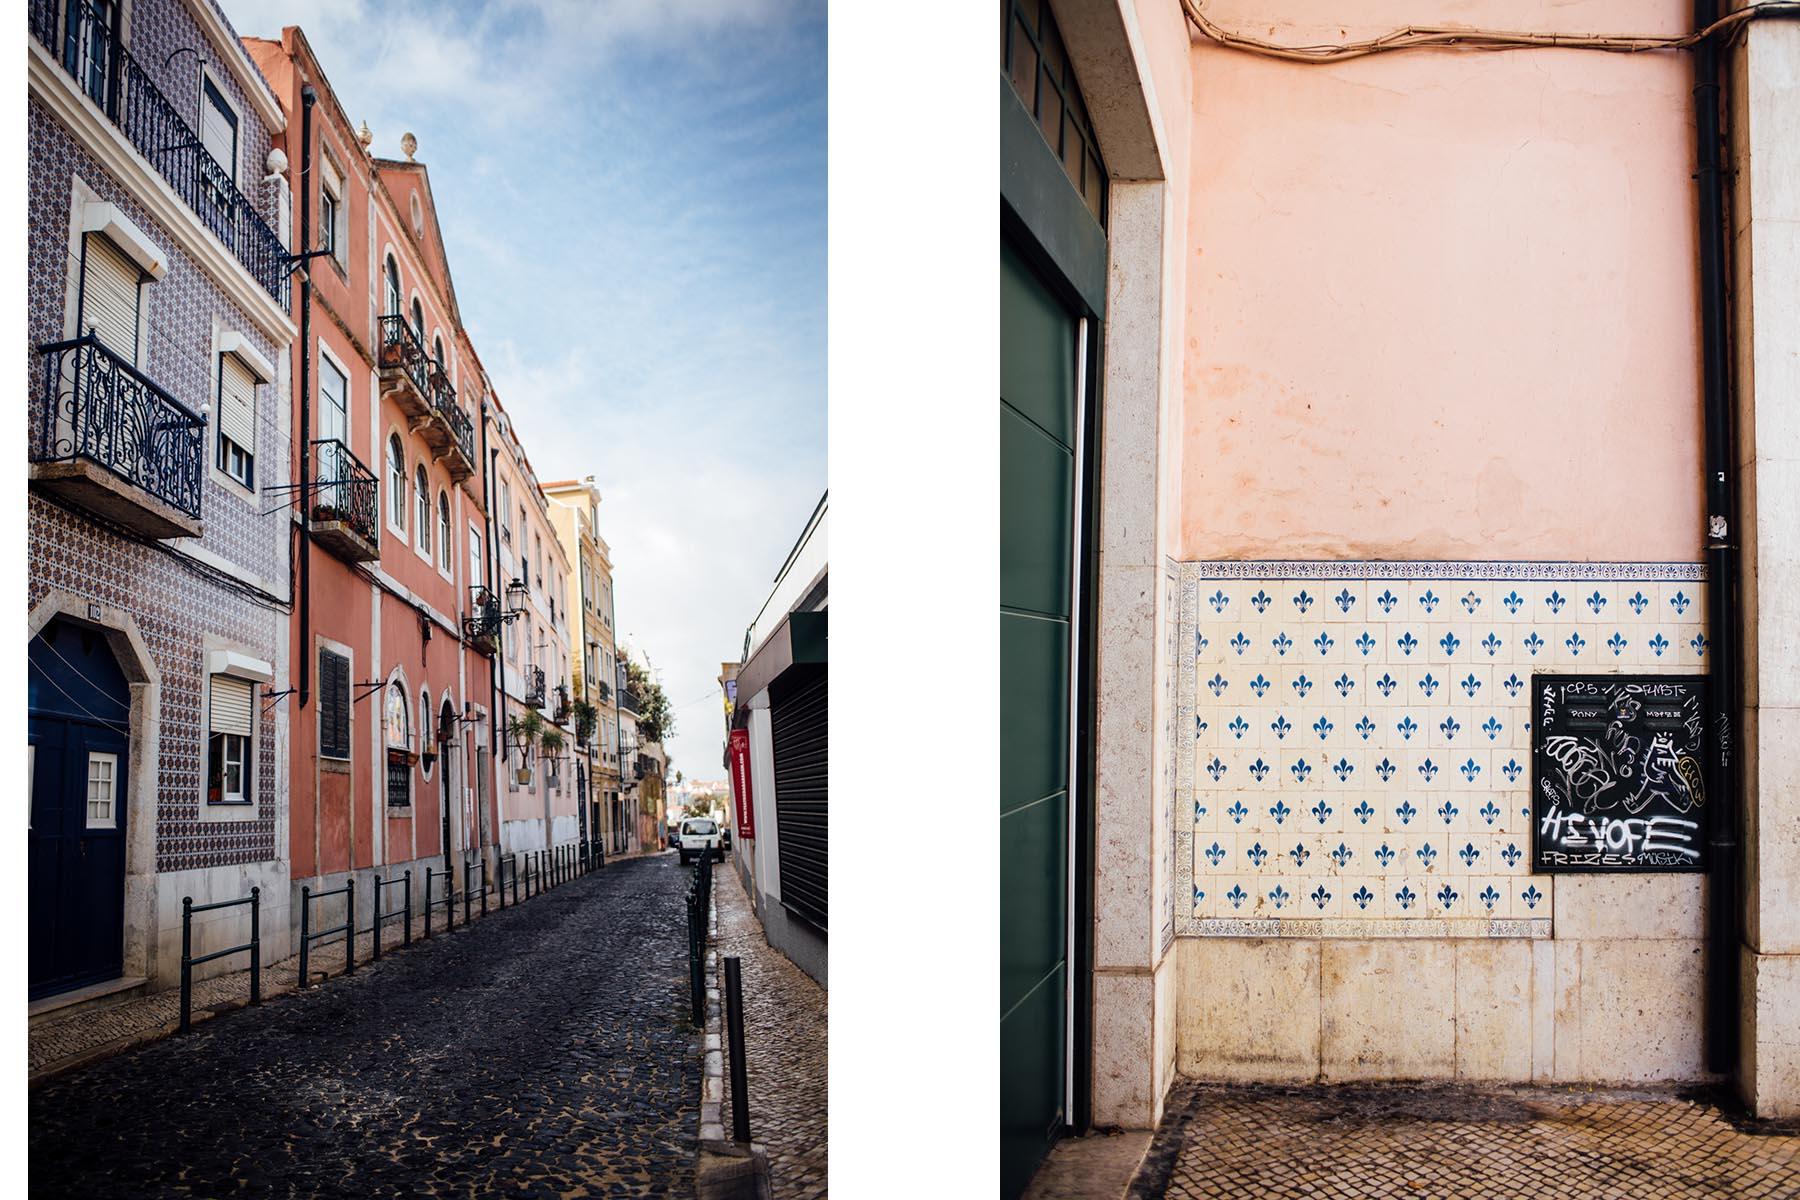 lissabon_streets_03.jpg